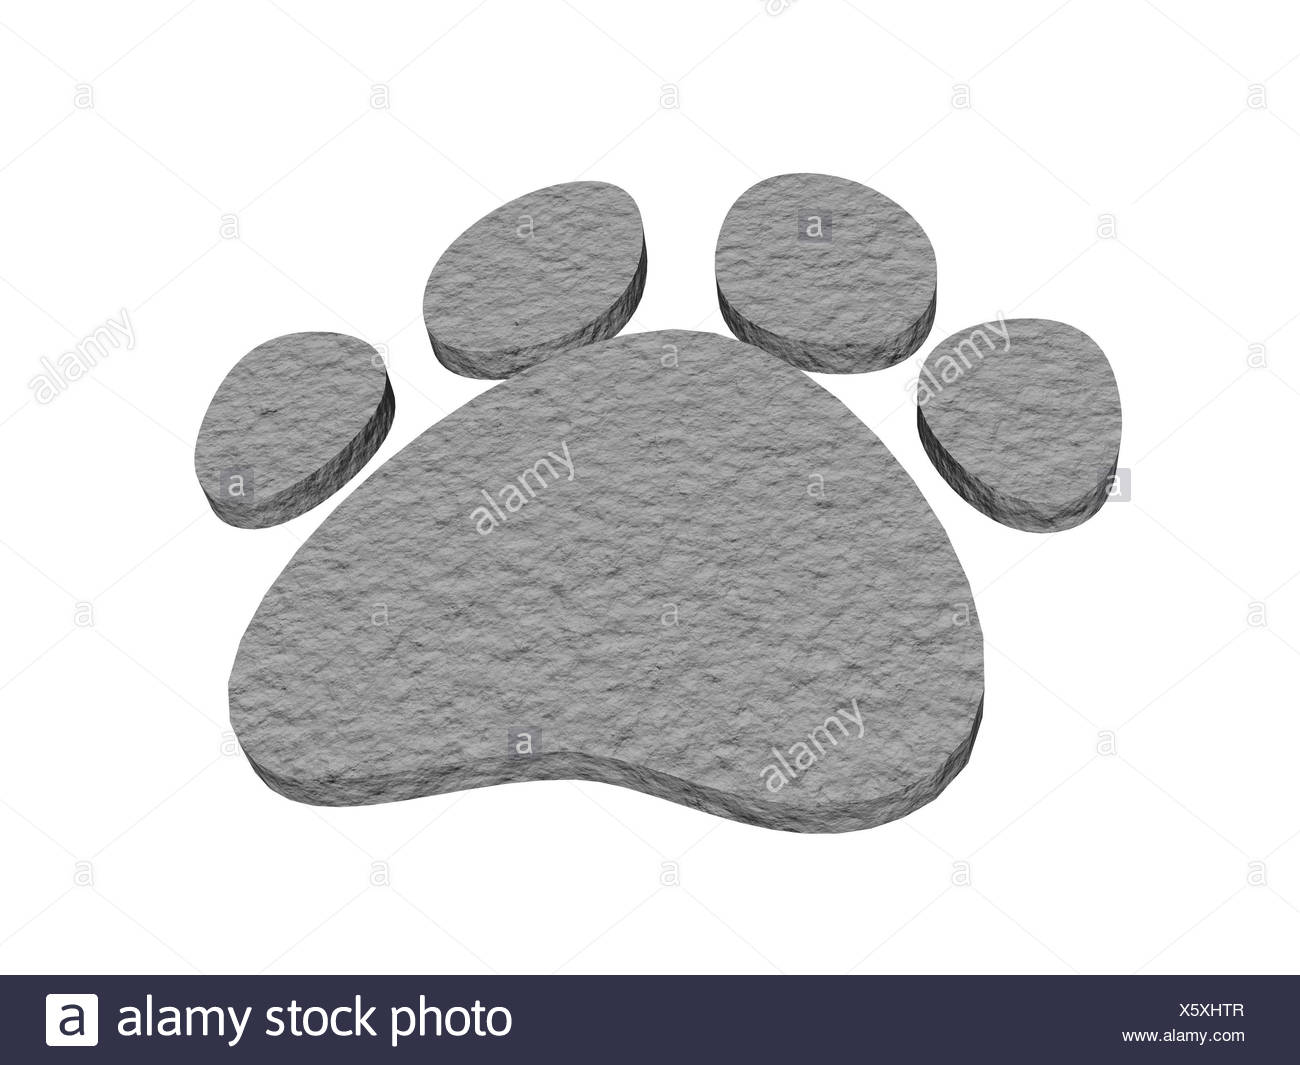 exempted animal tracks - Stock Image